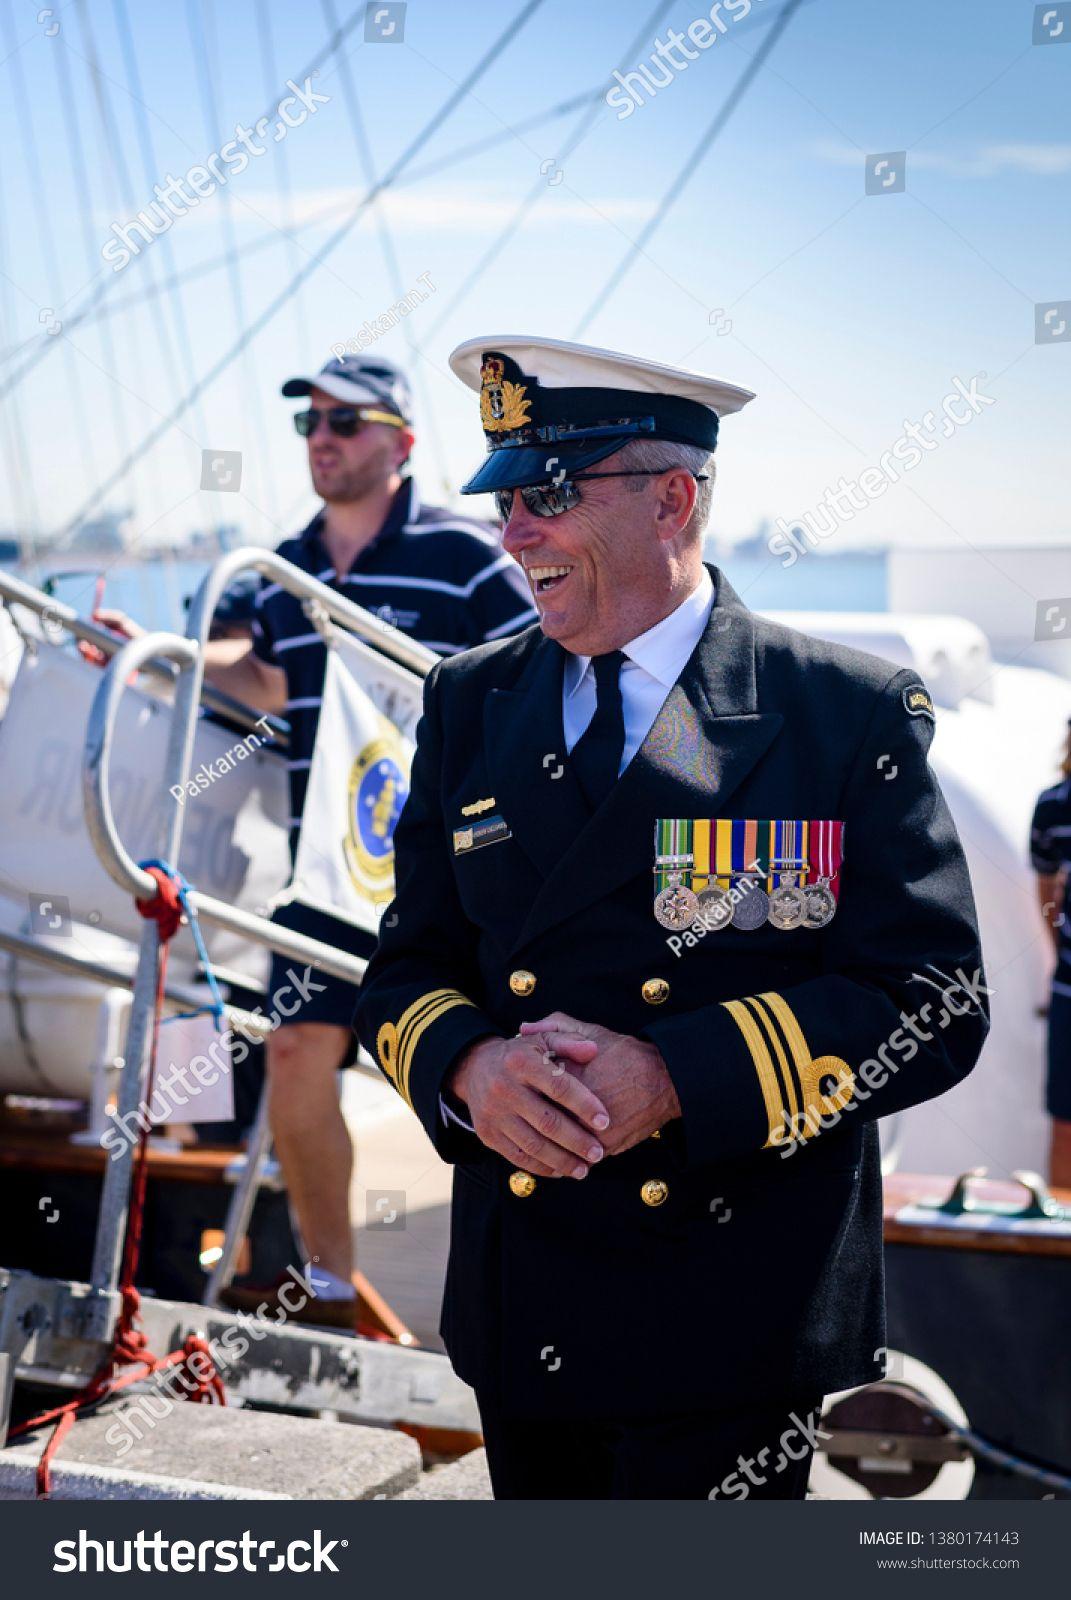 Newcastle New South Wales Australia 25 April 2019 Captain Of Young Endeavour Ship Lieutenant Commander Andrew Callander New South Wales Newcastle Anzac Day